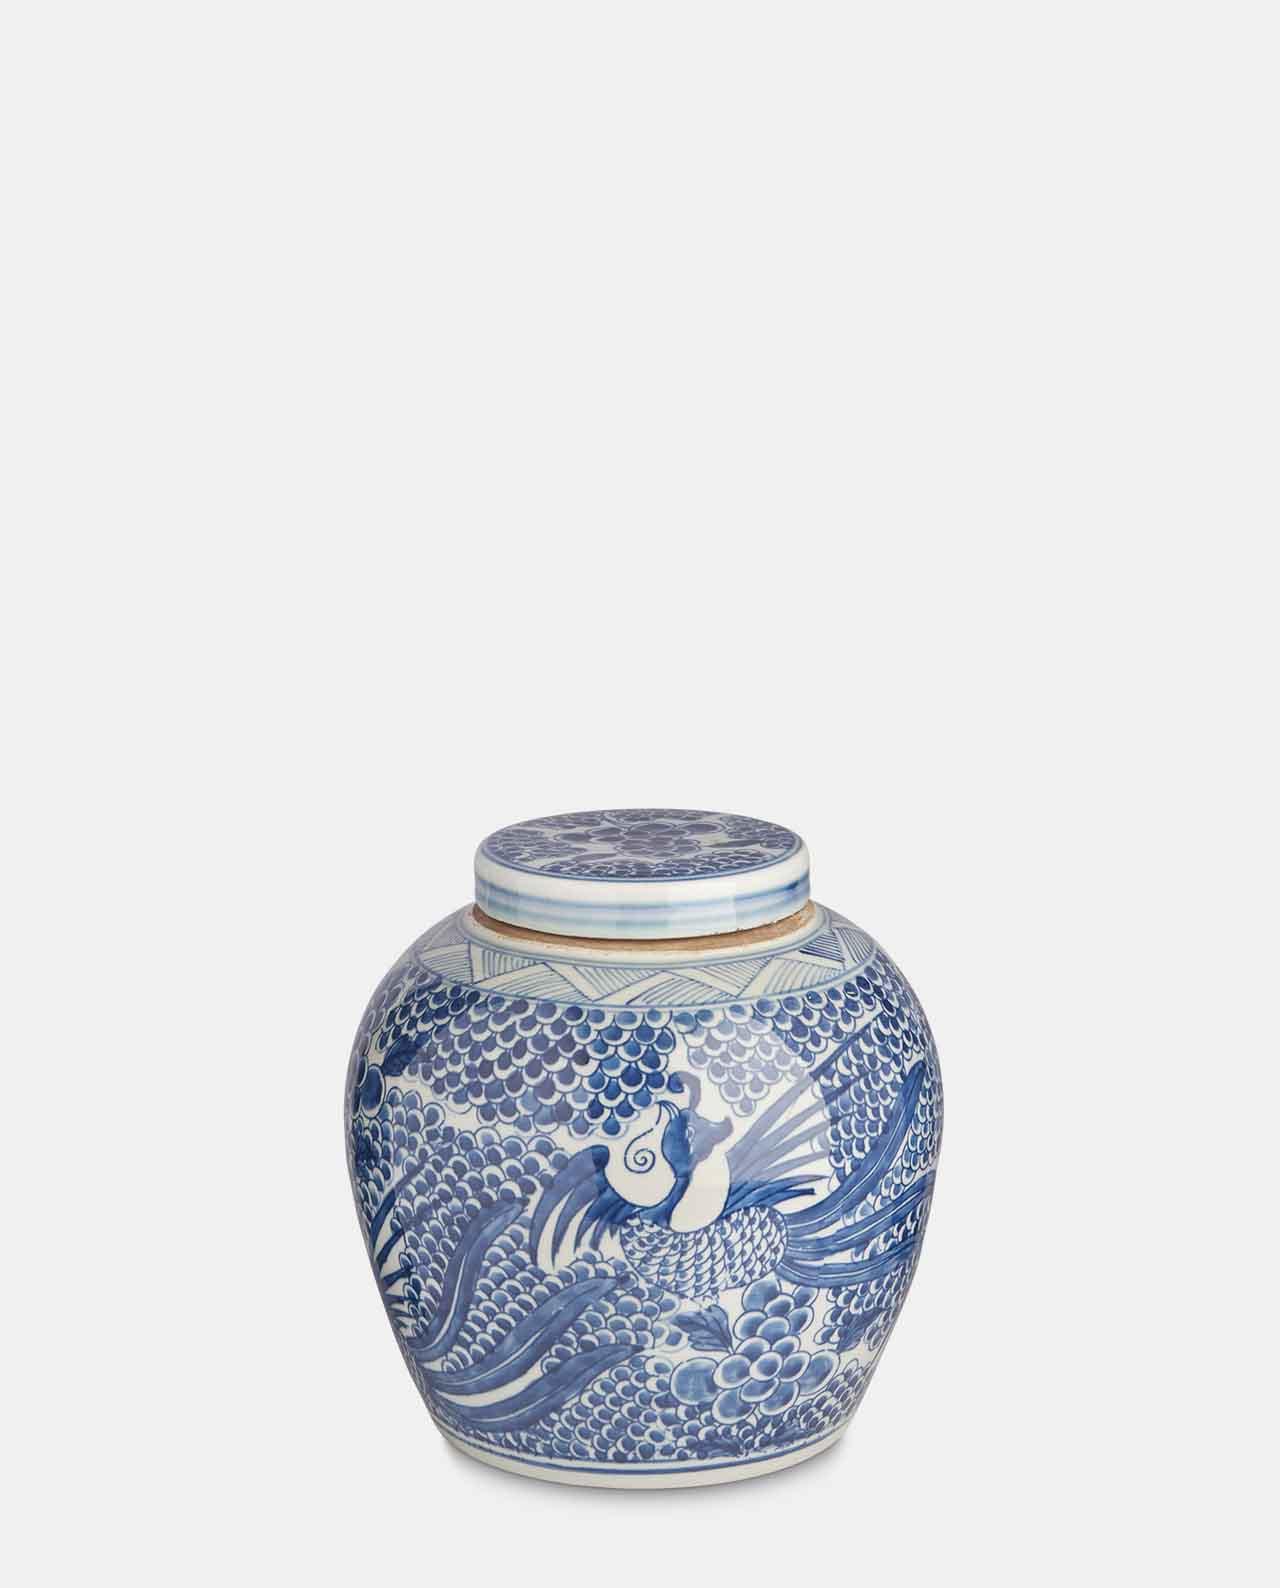 Blue & White Porcelain Jar No 3